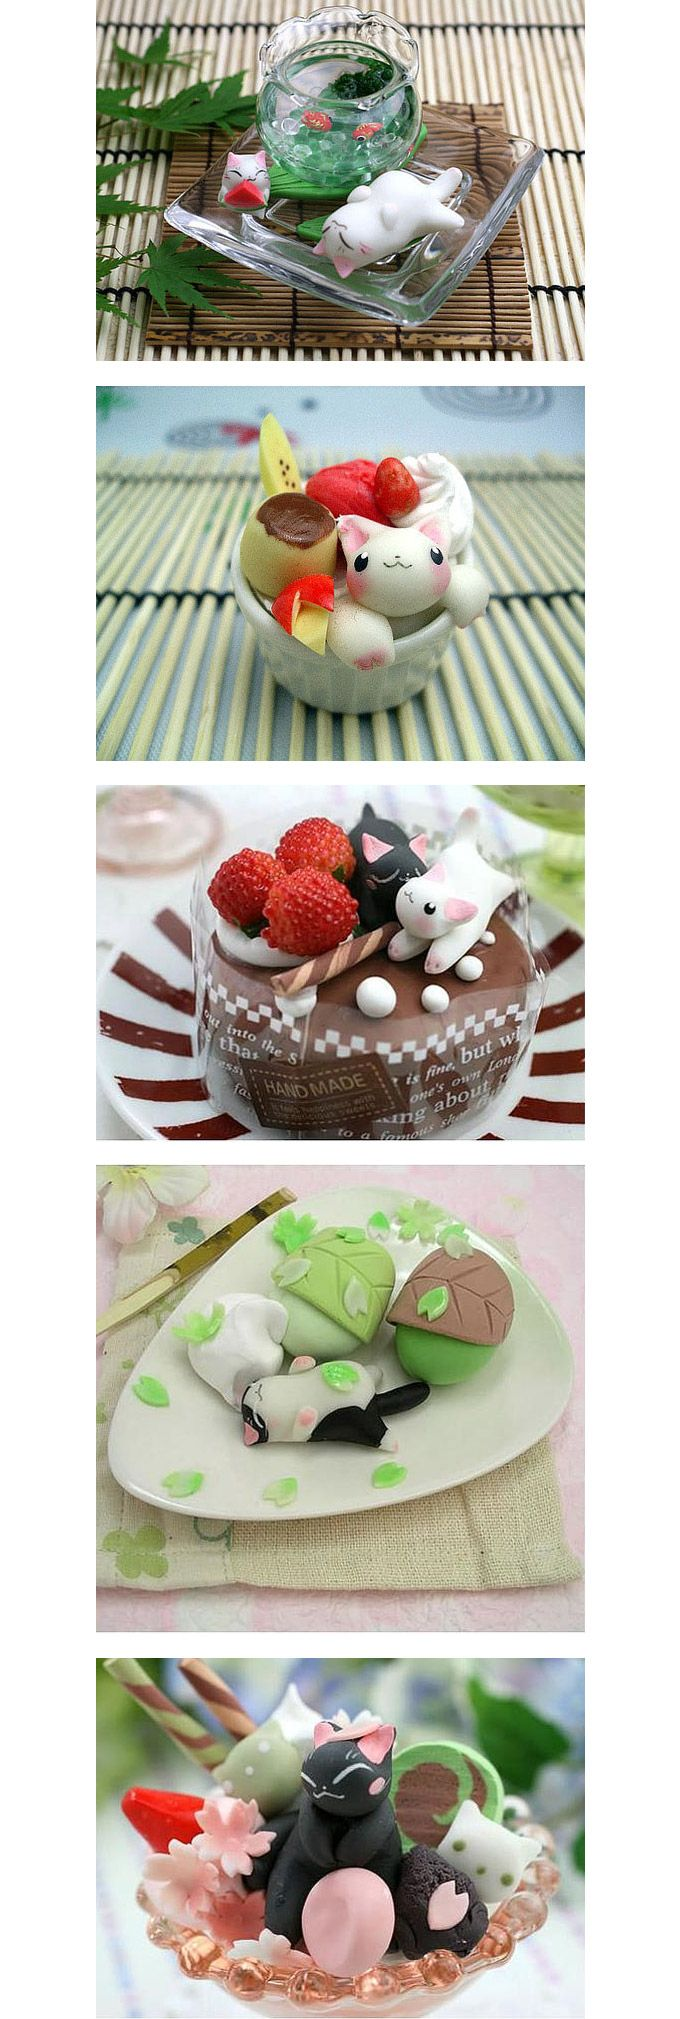 kawaii desserts SOOOOOOOO CUUUUUUUTTTEEE!!!